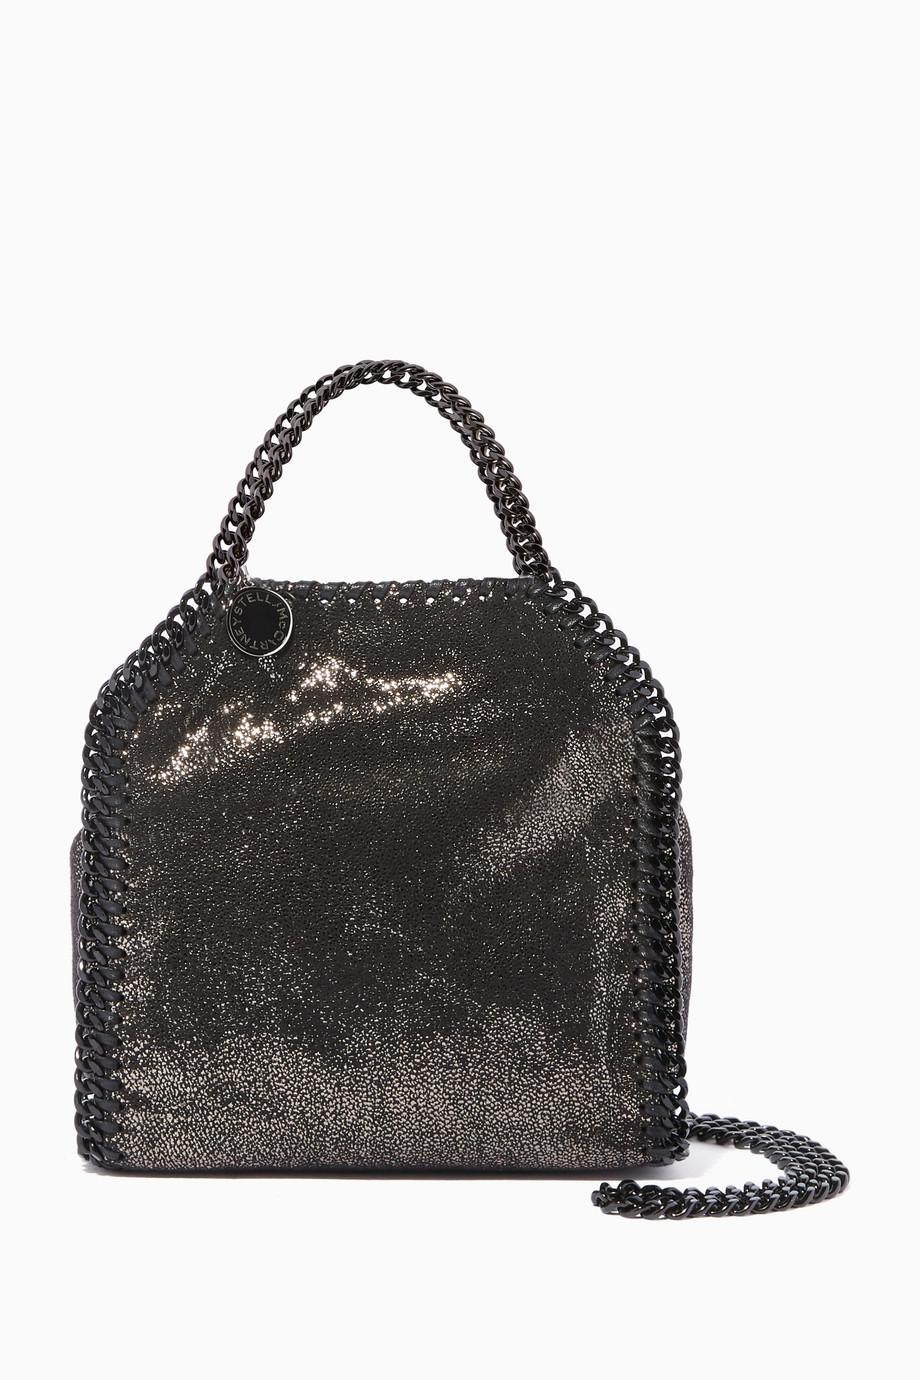 0b2450f8d7ef7 تسوق حقيبة فالابيلا كروس شمواه صغيرة سوداء Stella McCartney أسود ...